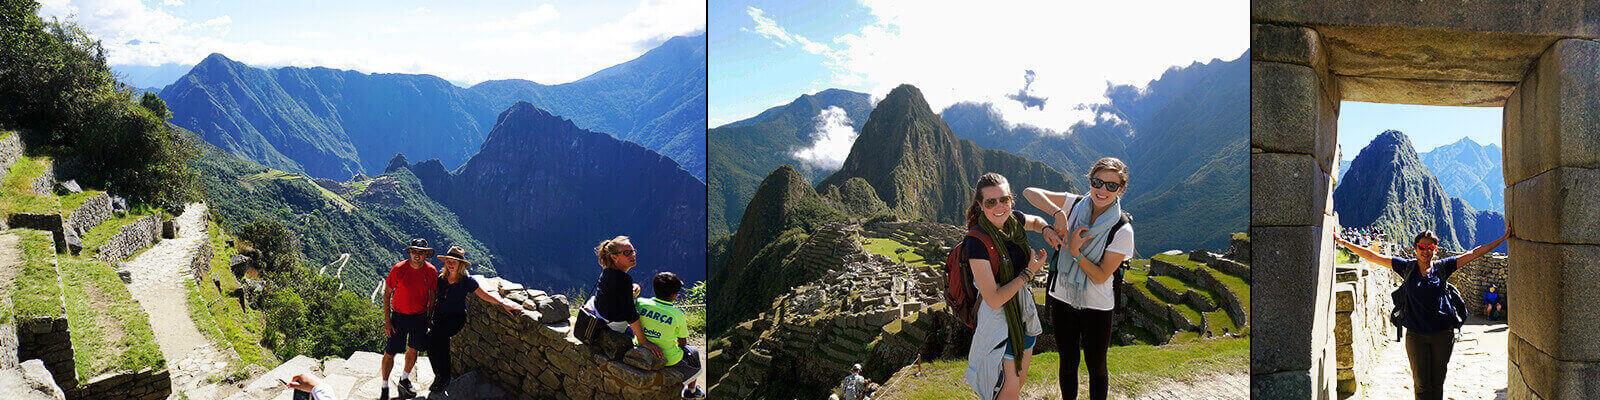 camino-inca-corto-trekking-machu-picchu-andes-tours